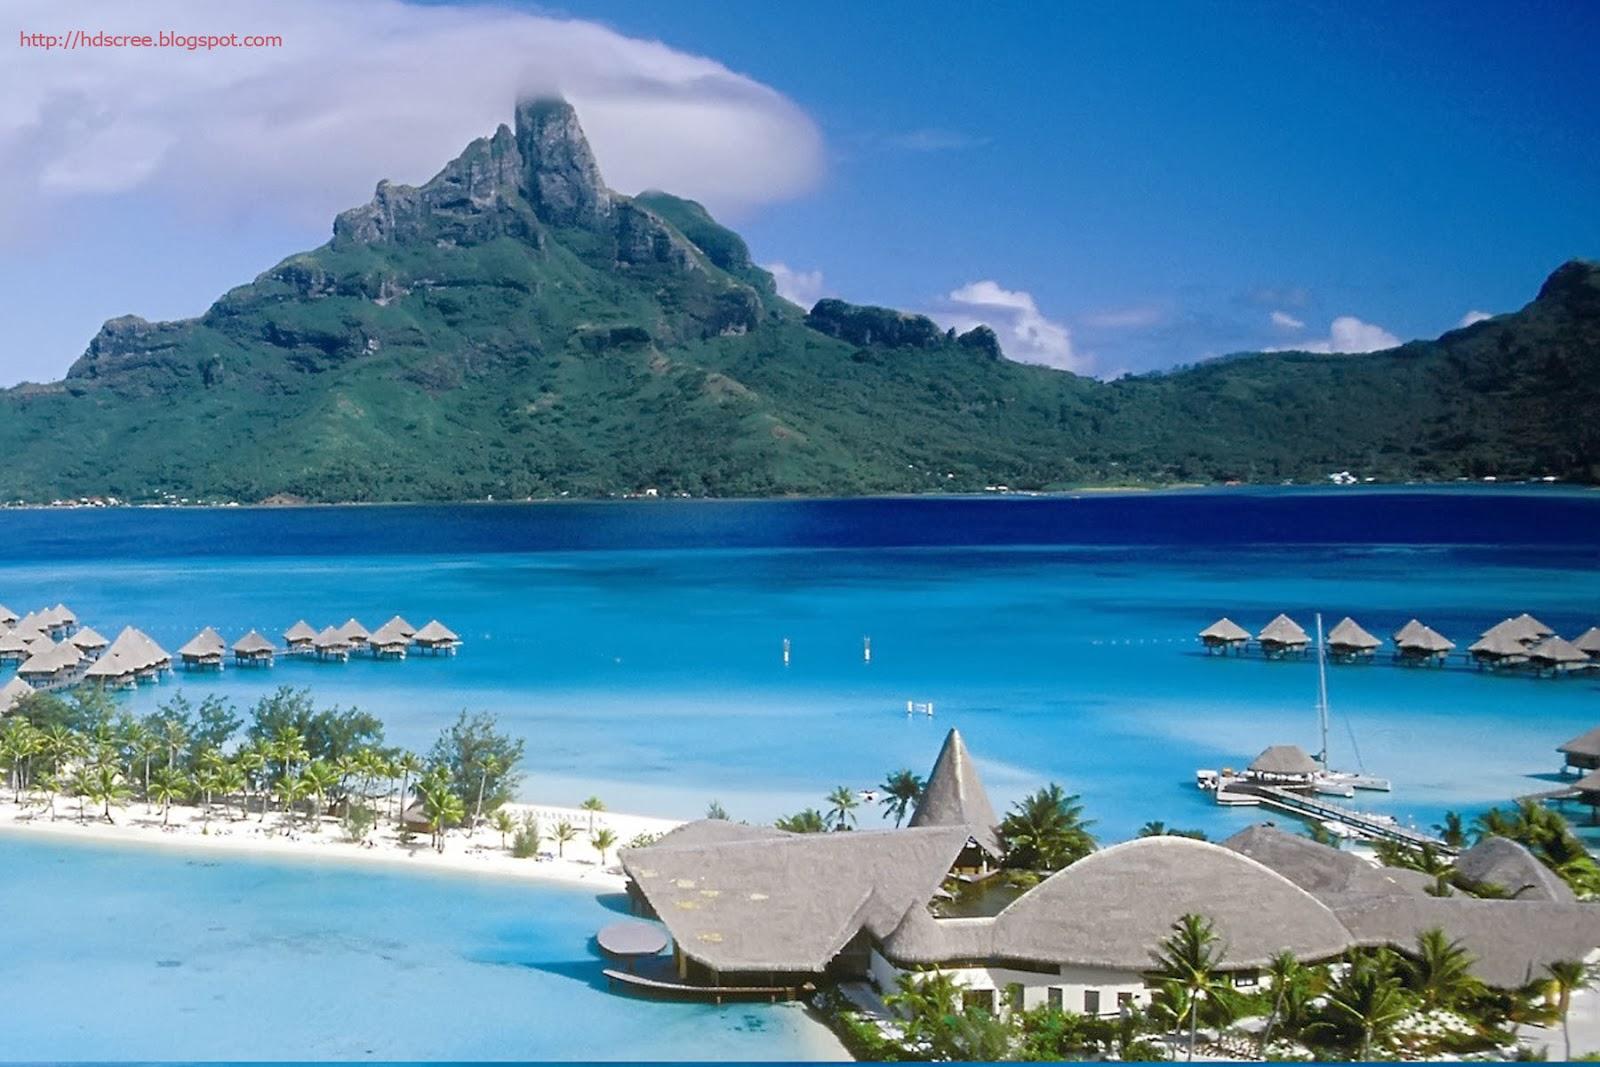 Bora Bora Bungalows 4k Hd Desktop Wallpaper For Wide: Bora Bora Hd Wallpaper